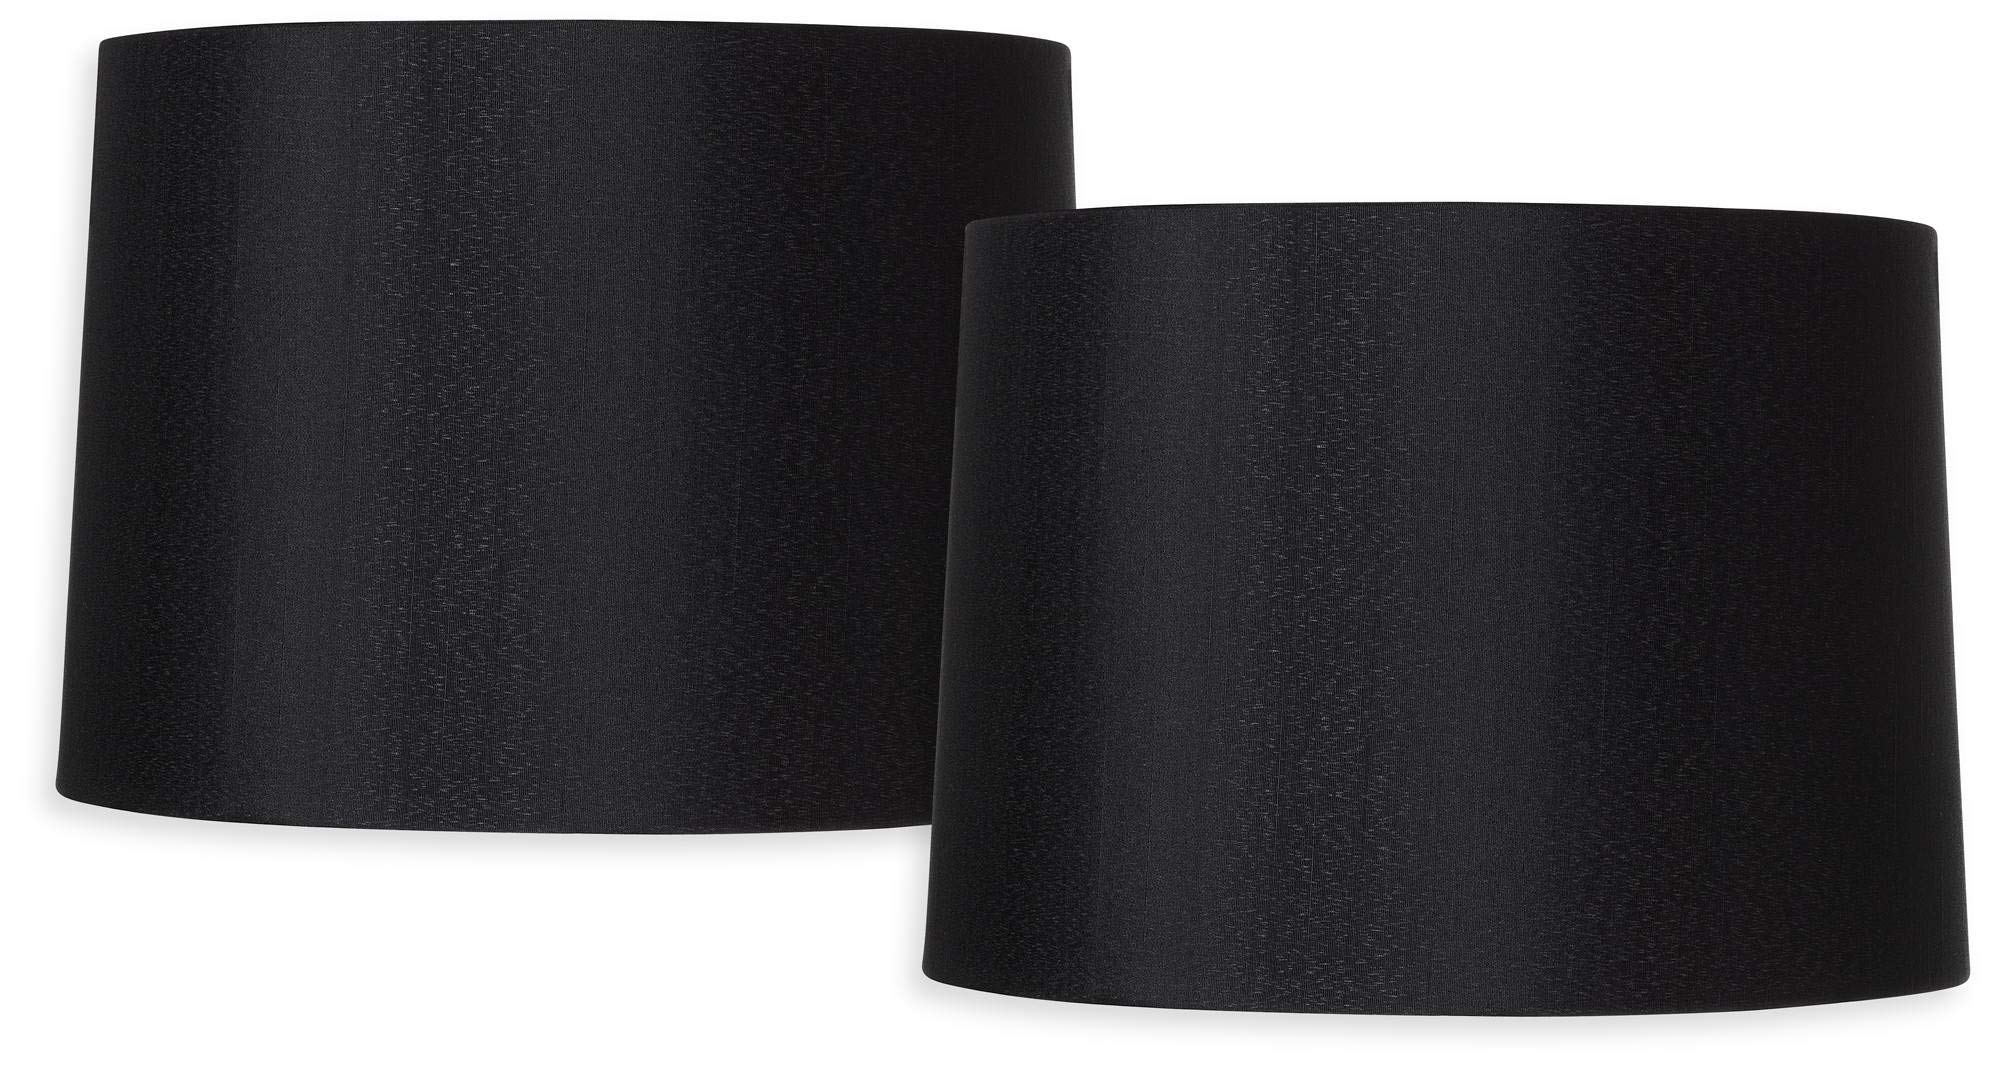 Black Set of 2 Hardback Drum Shades 13x14x10.25 (Spider) - Brentwood